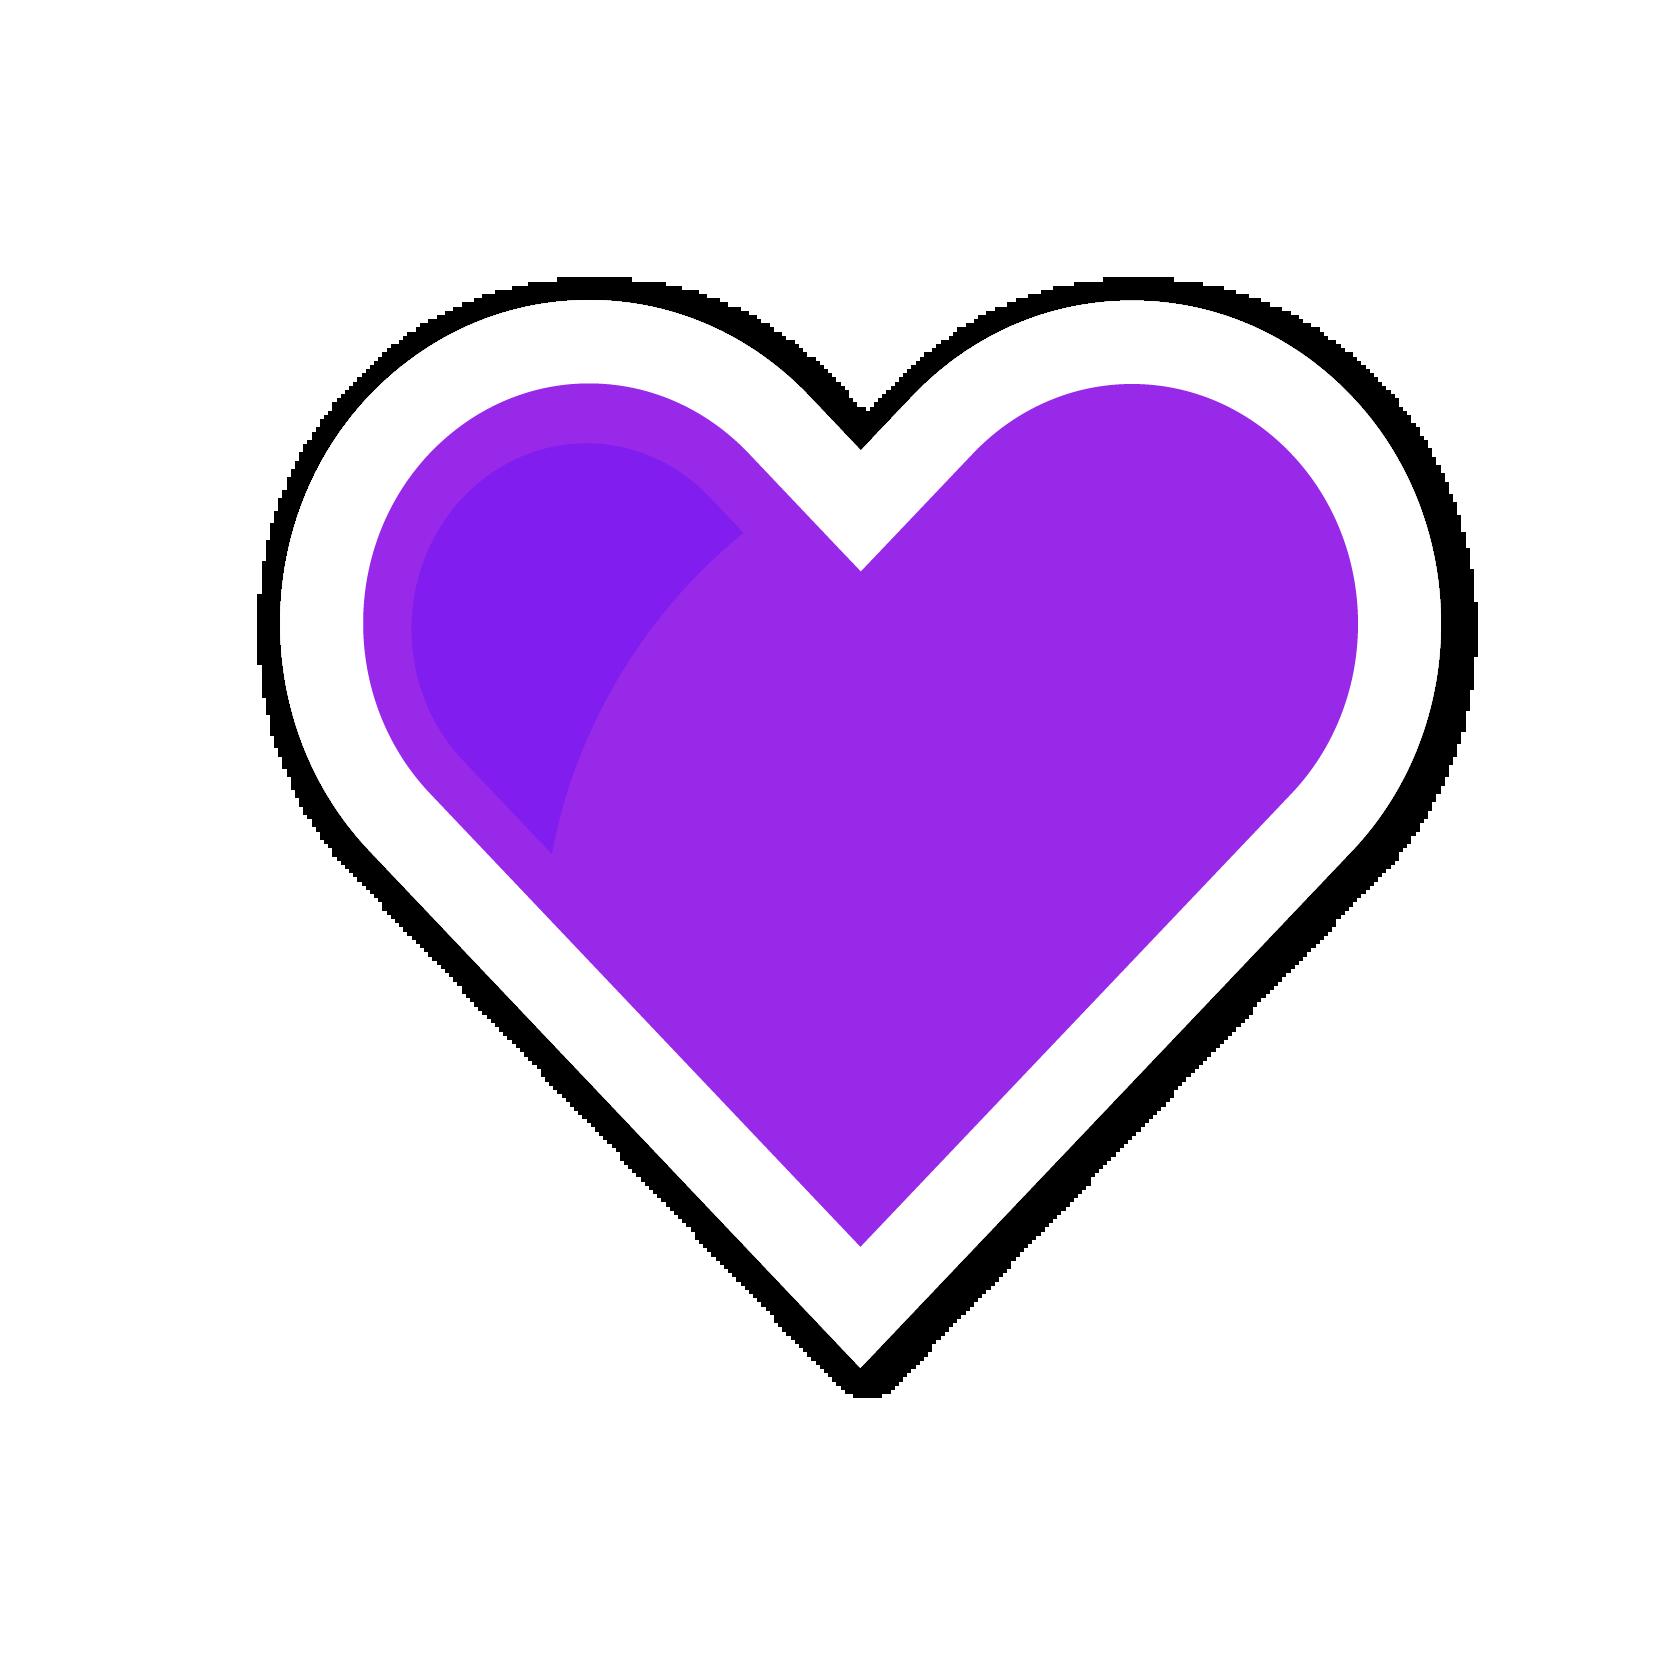 A violet heart sticker